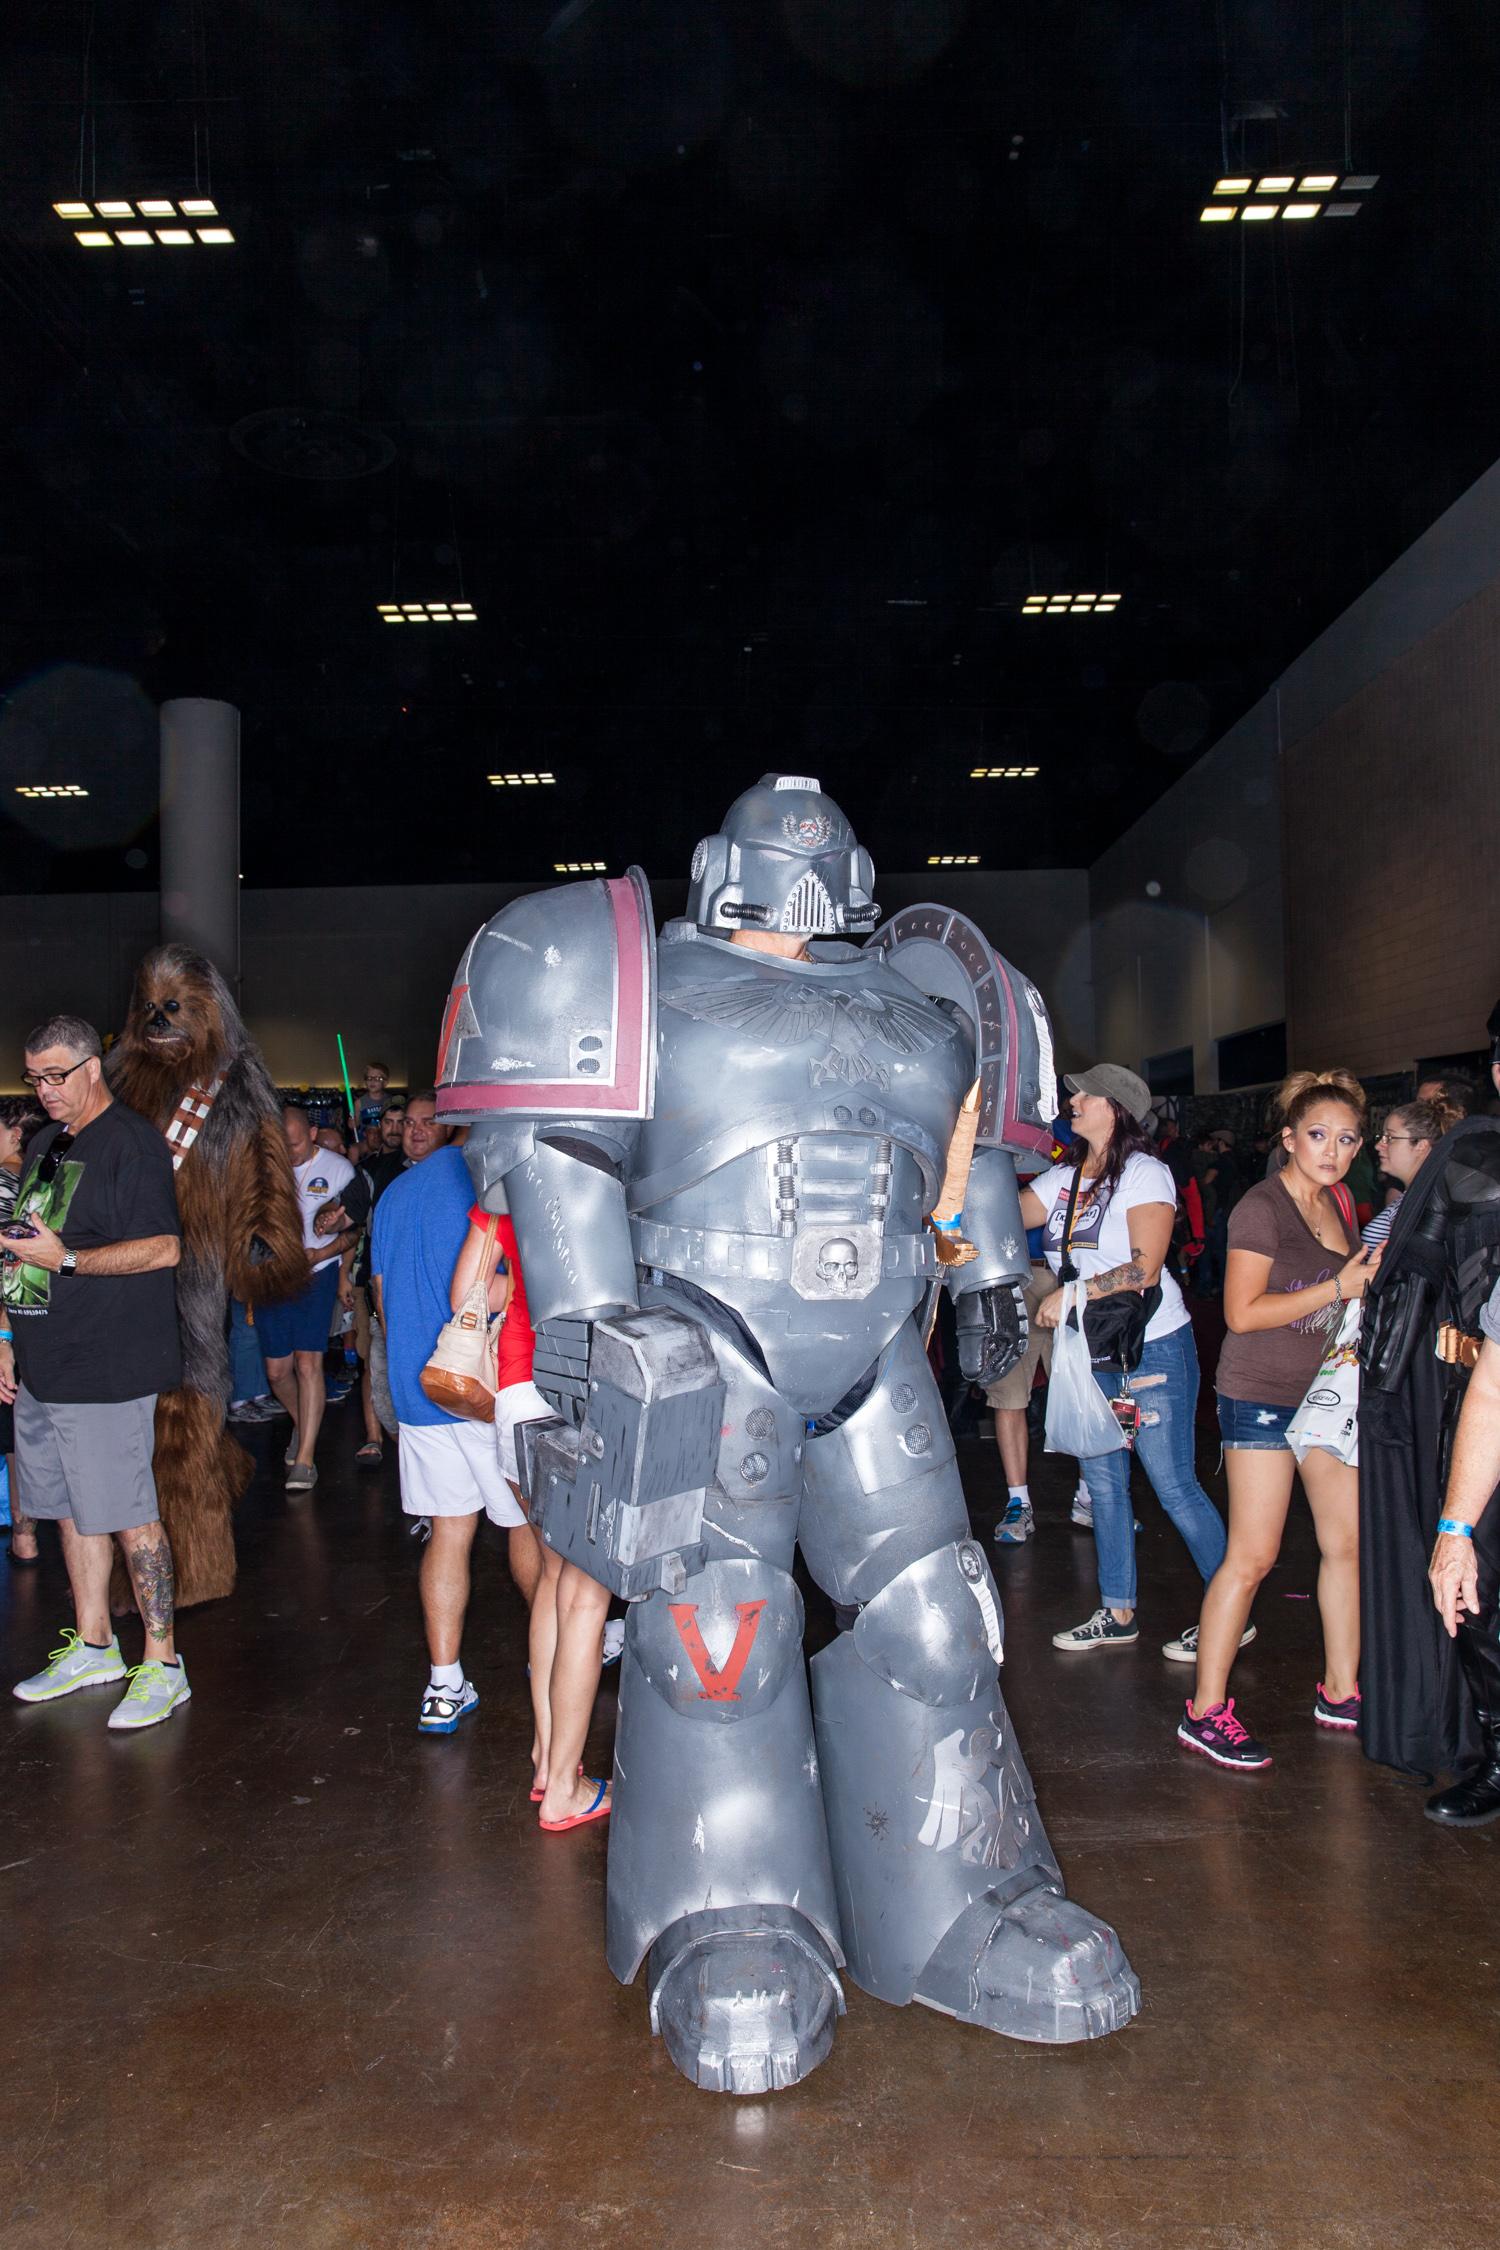 comic con large robot tampa bay florida convention center